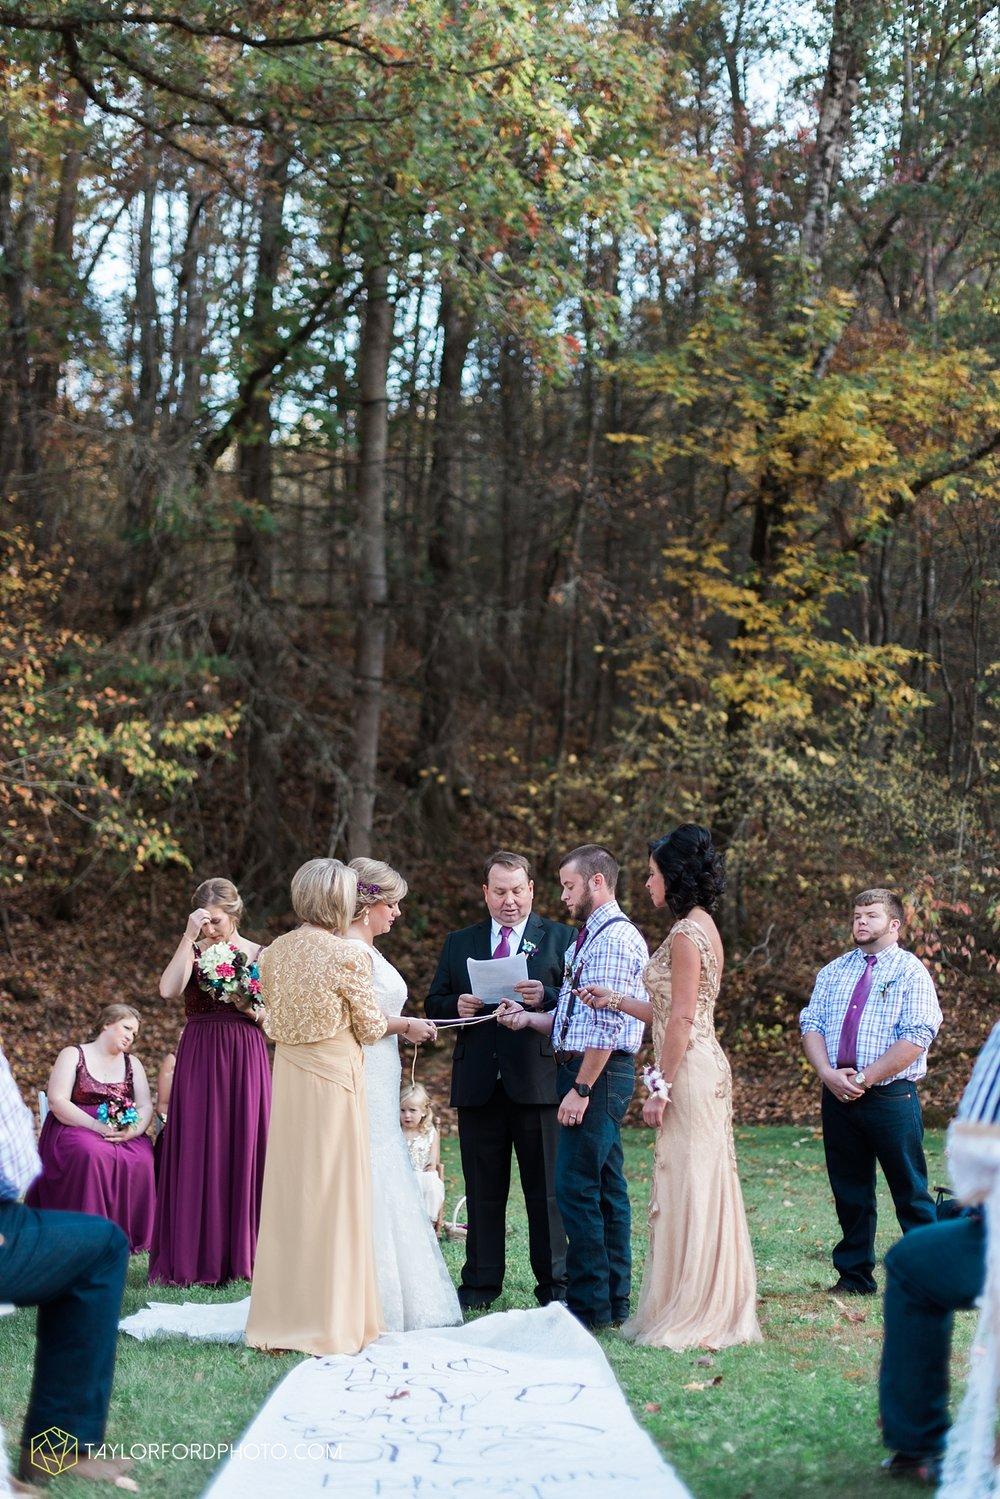 gatlinburg_tennessee_photographer_taylor_ford_weddings_enchanted_valley_barn_3863.jpg